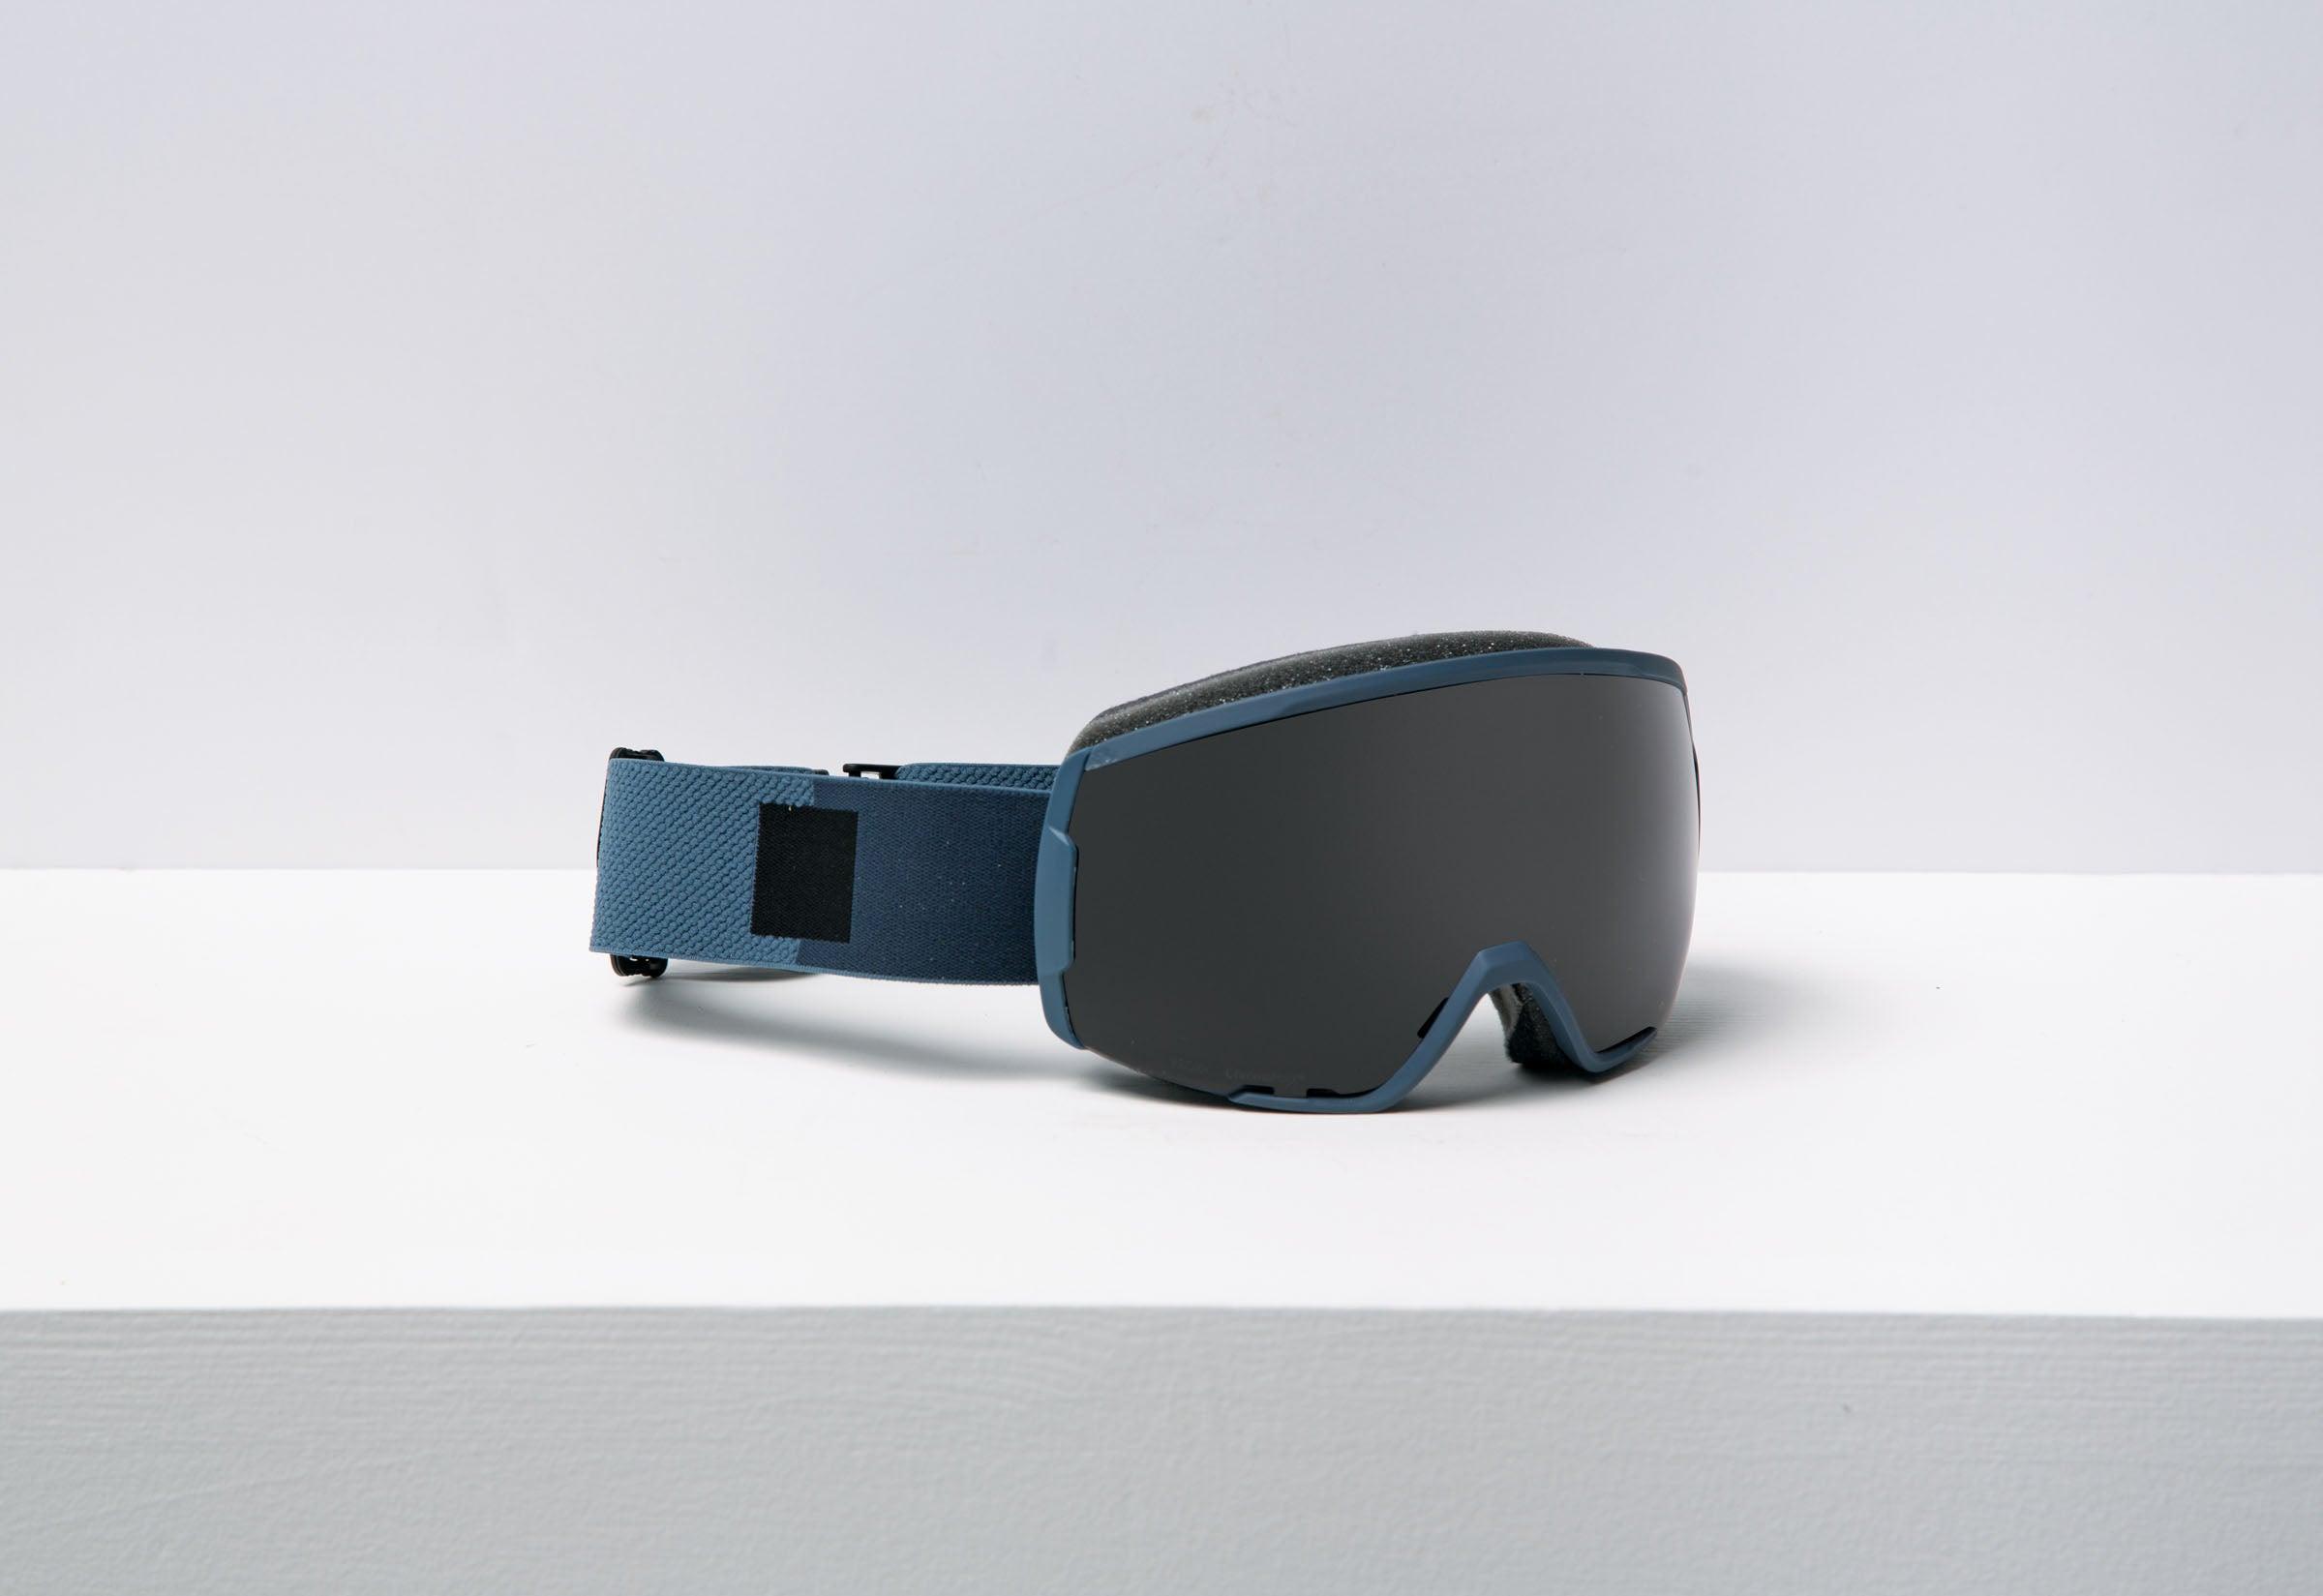 2022 SMITH Proxy goggles